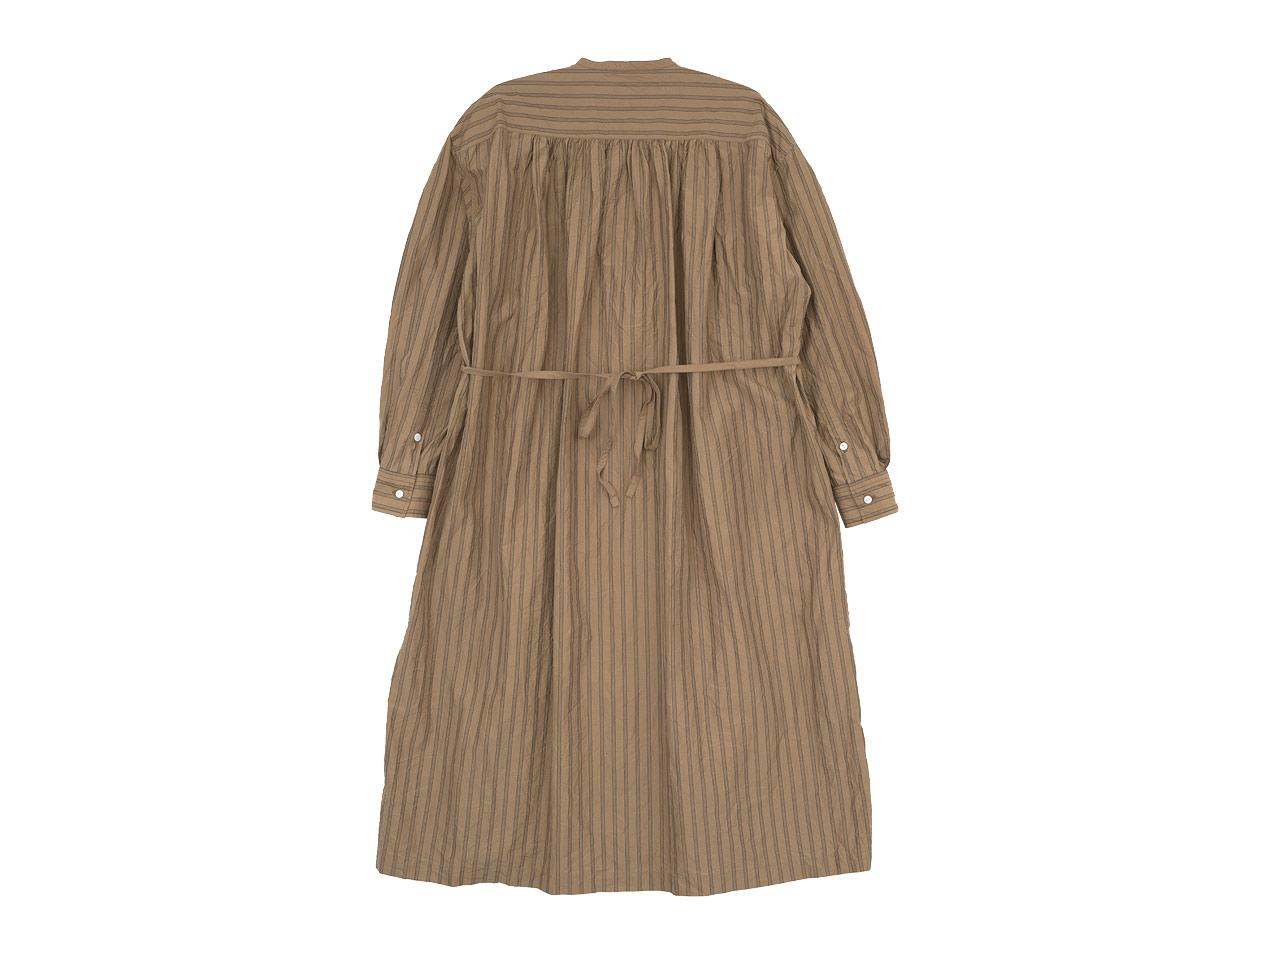 TOUJOURS Pin Tuck String Robe Dress CORK STRIPE【TM32FD01】